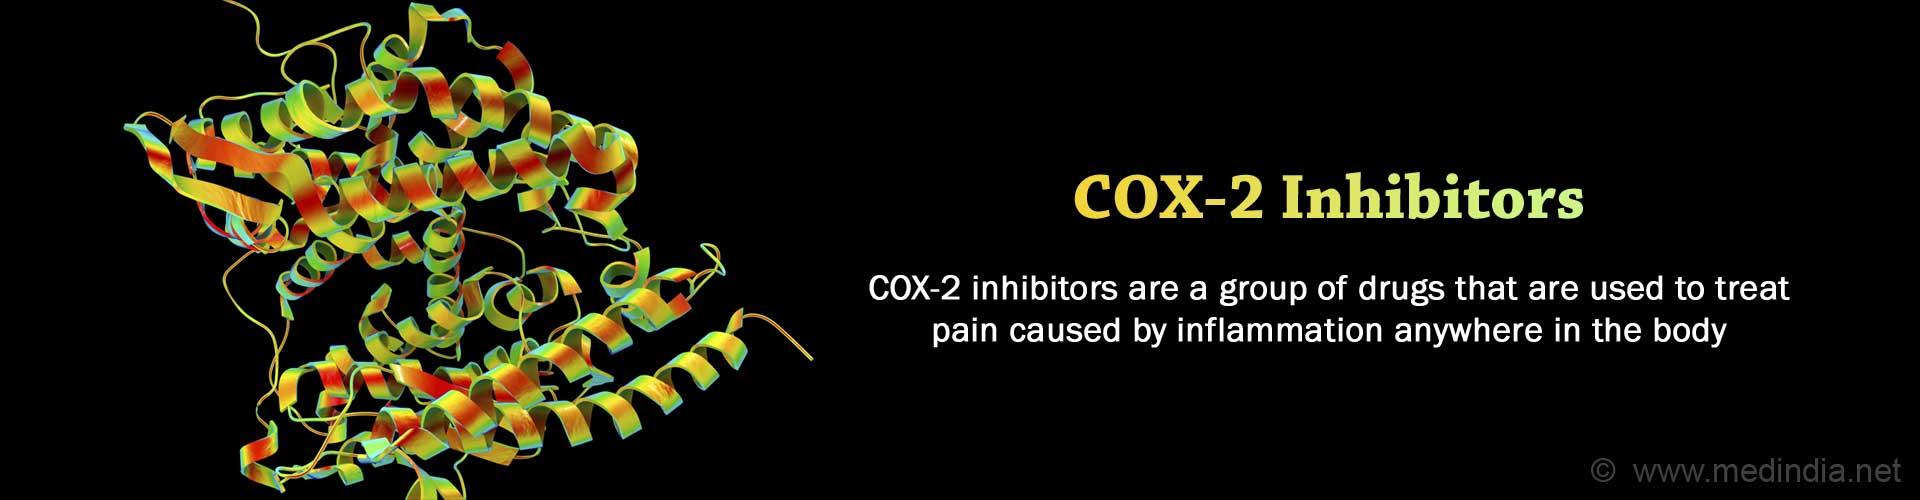 COX–2 Inhibitors, Selective Non-Steroidal Anti-Inflammatory Drugs